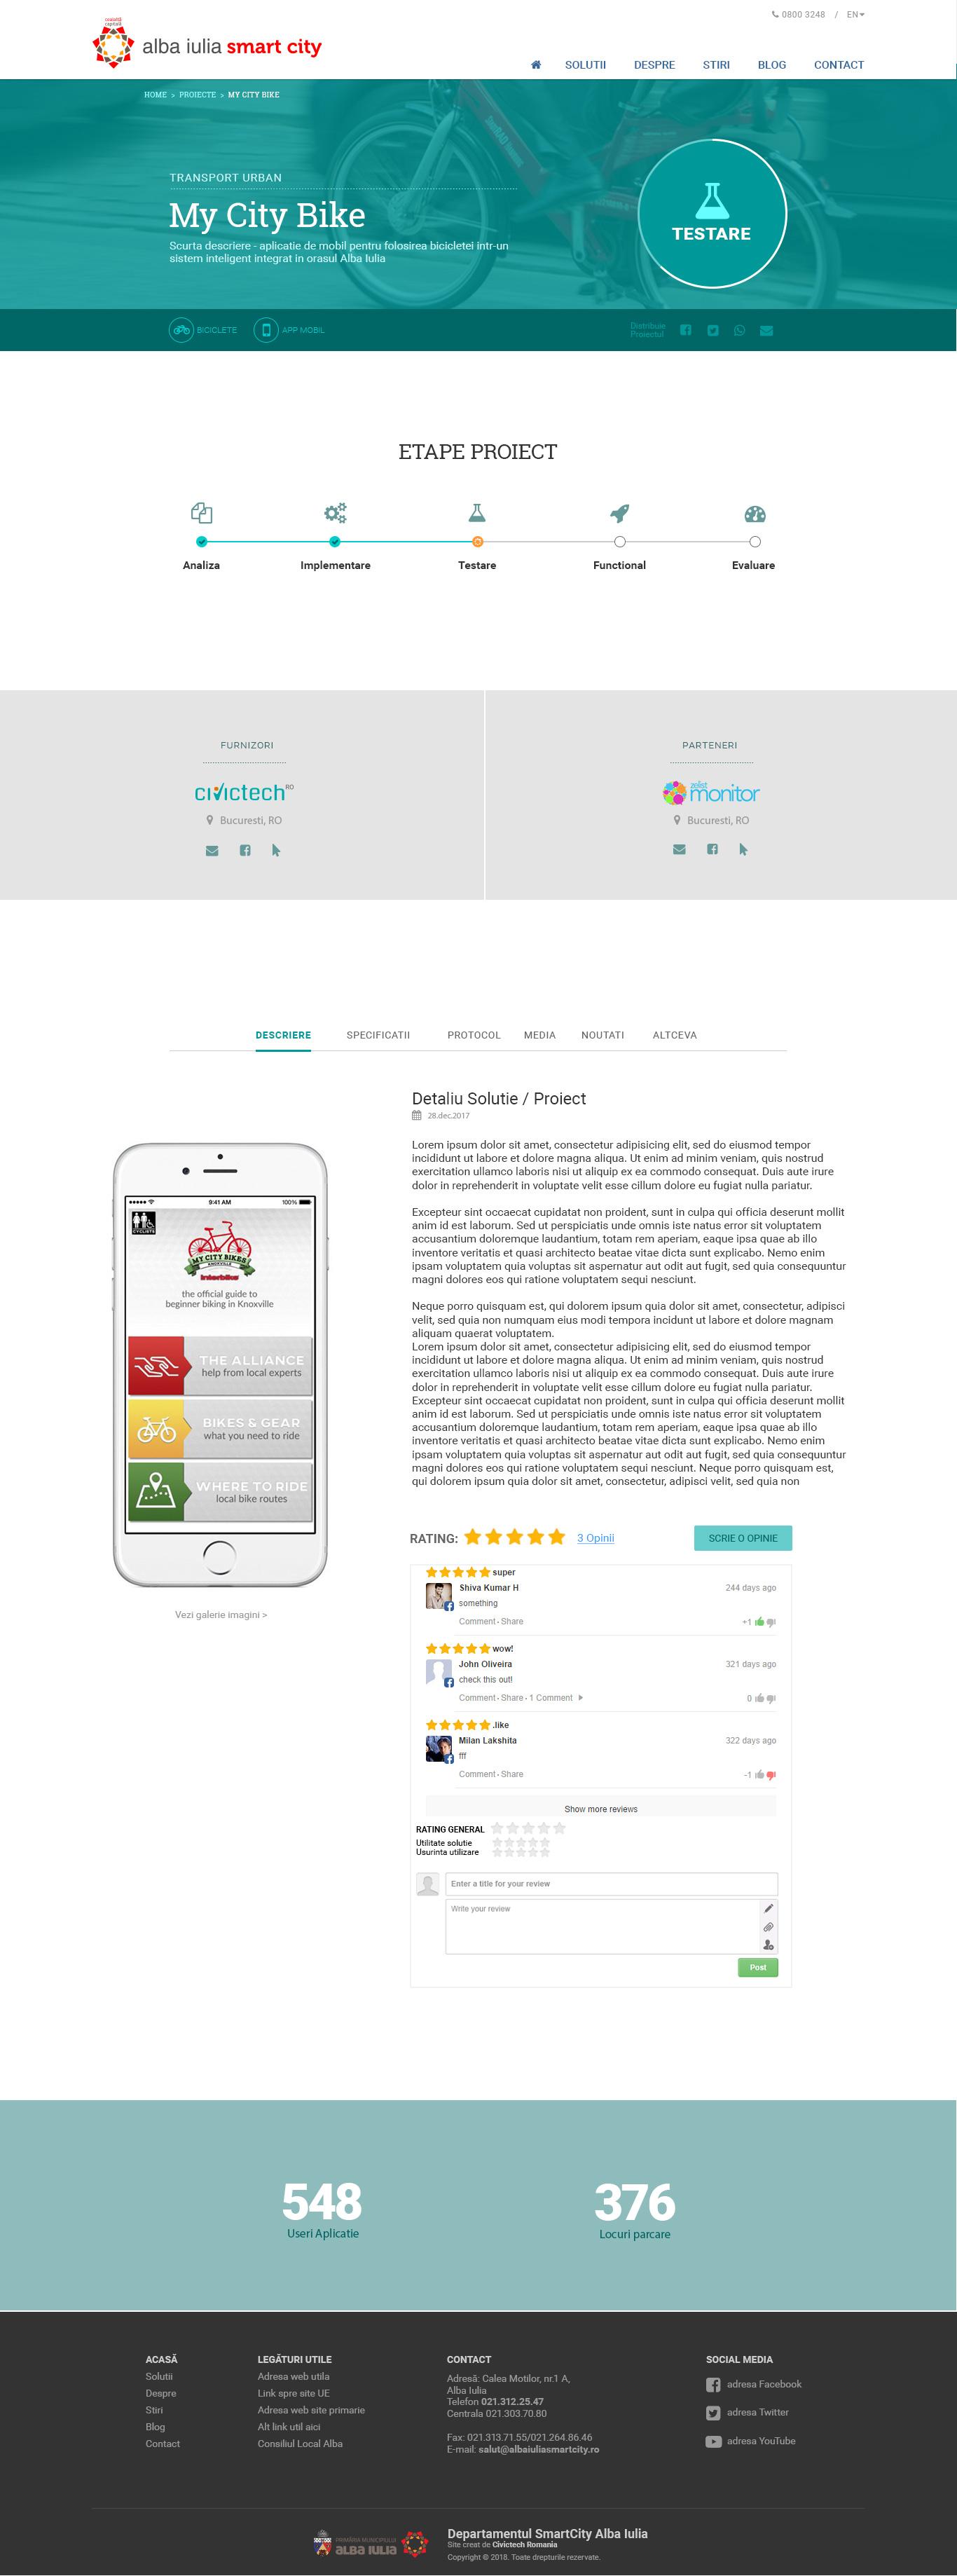 civictech_albasmart_projdetail_v3_comments_update-15-ian-copy 1